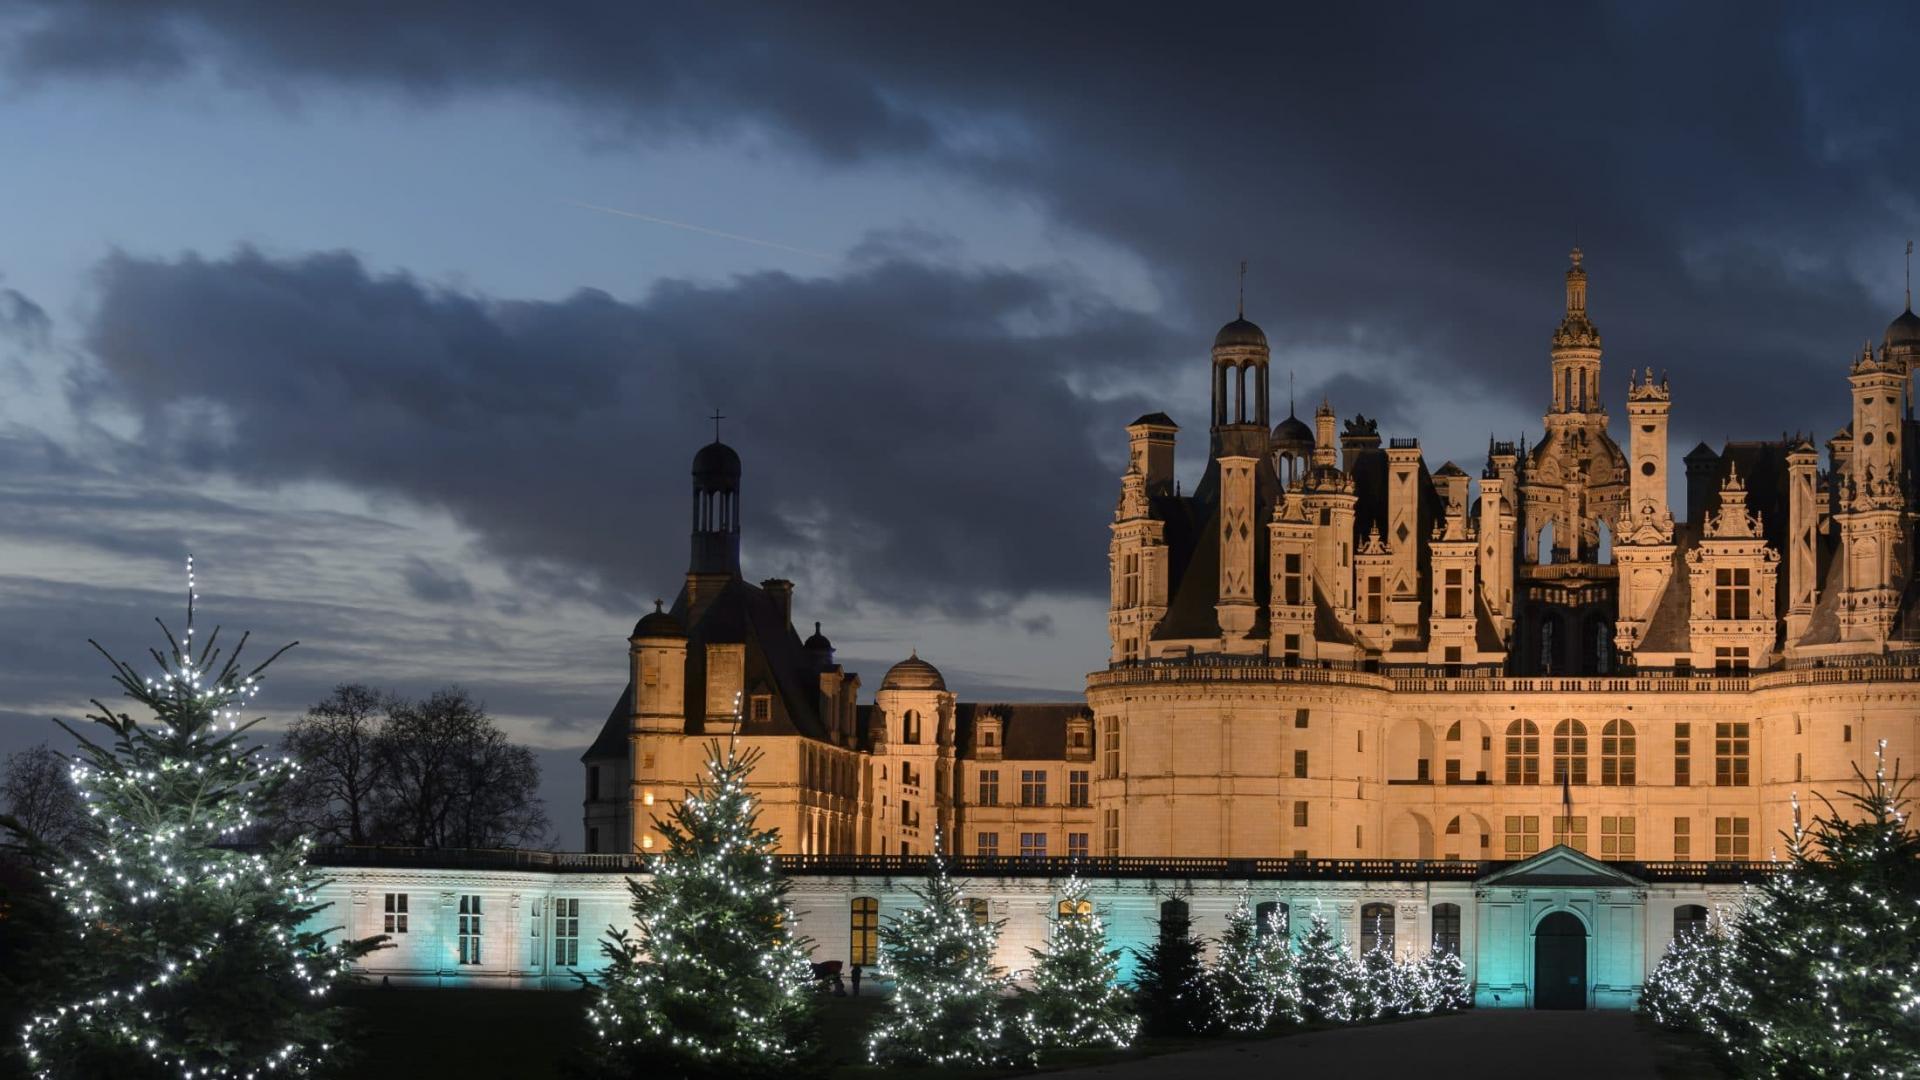 Noël au château Chambord © Leonard De Serres 8